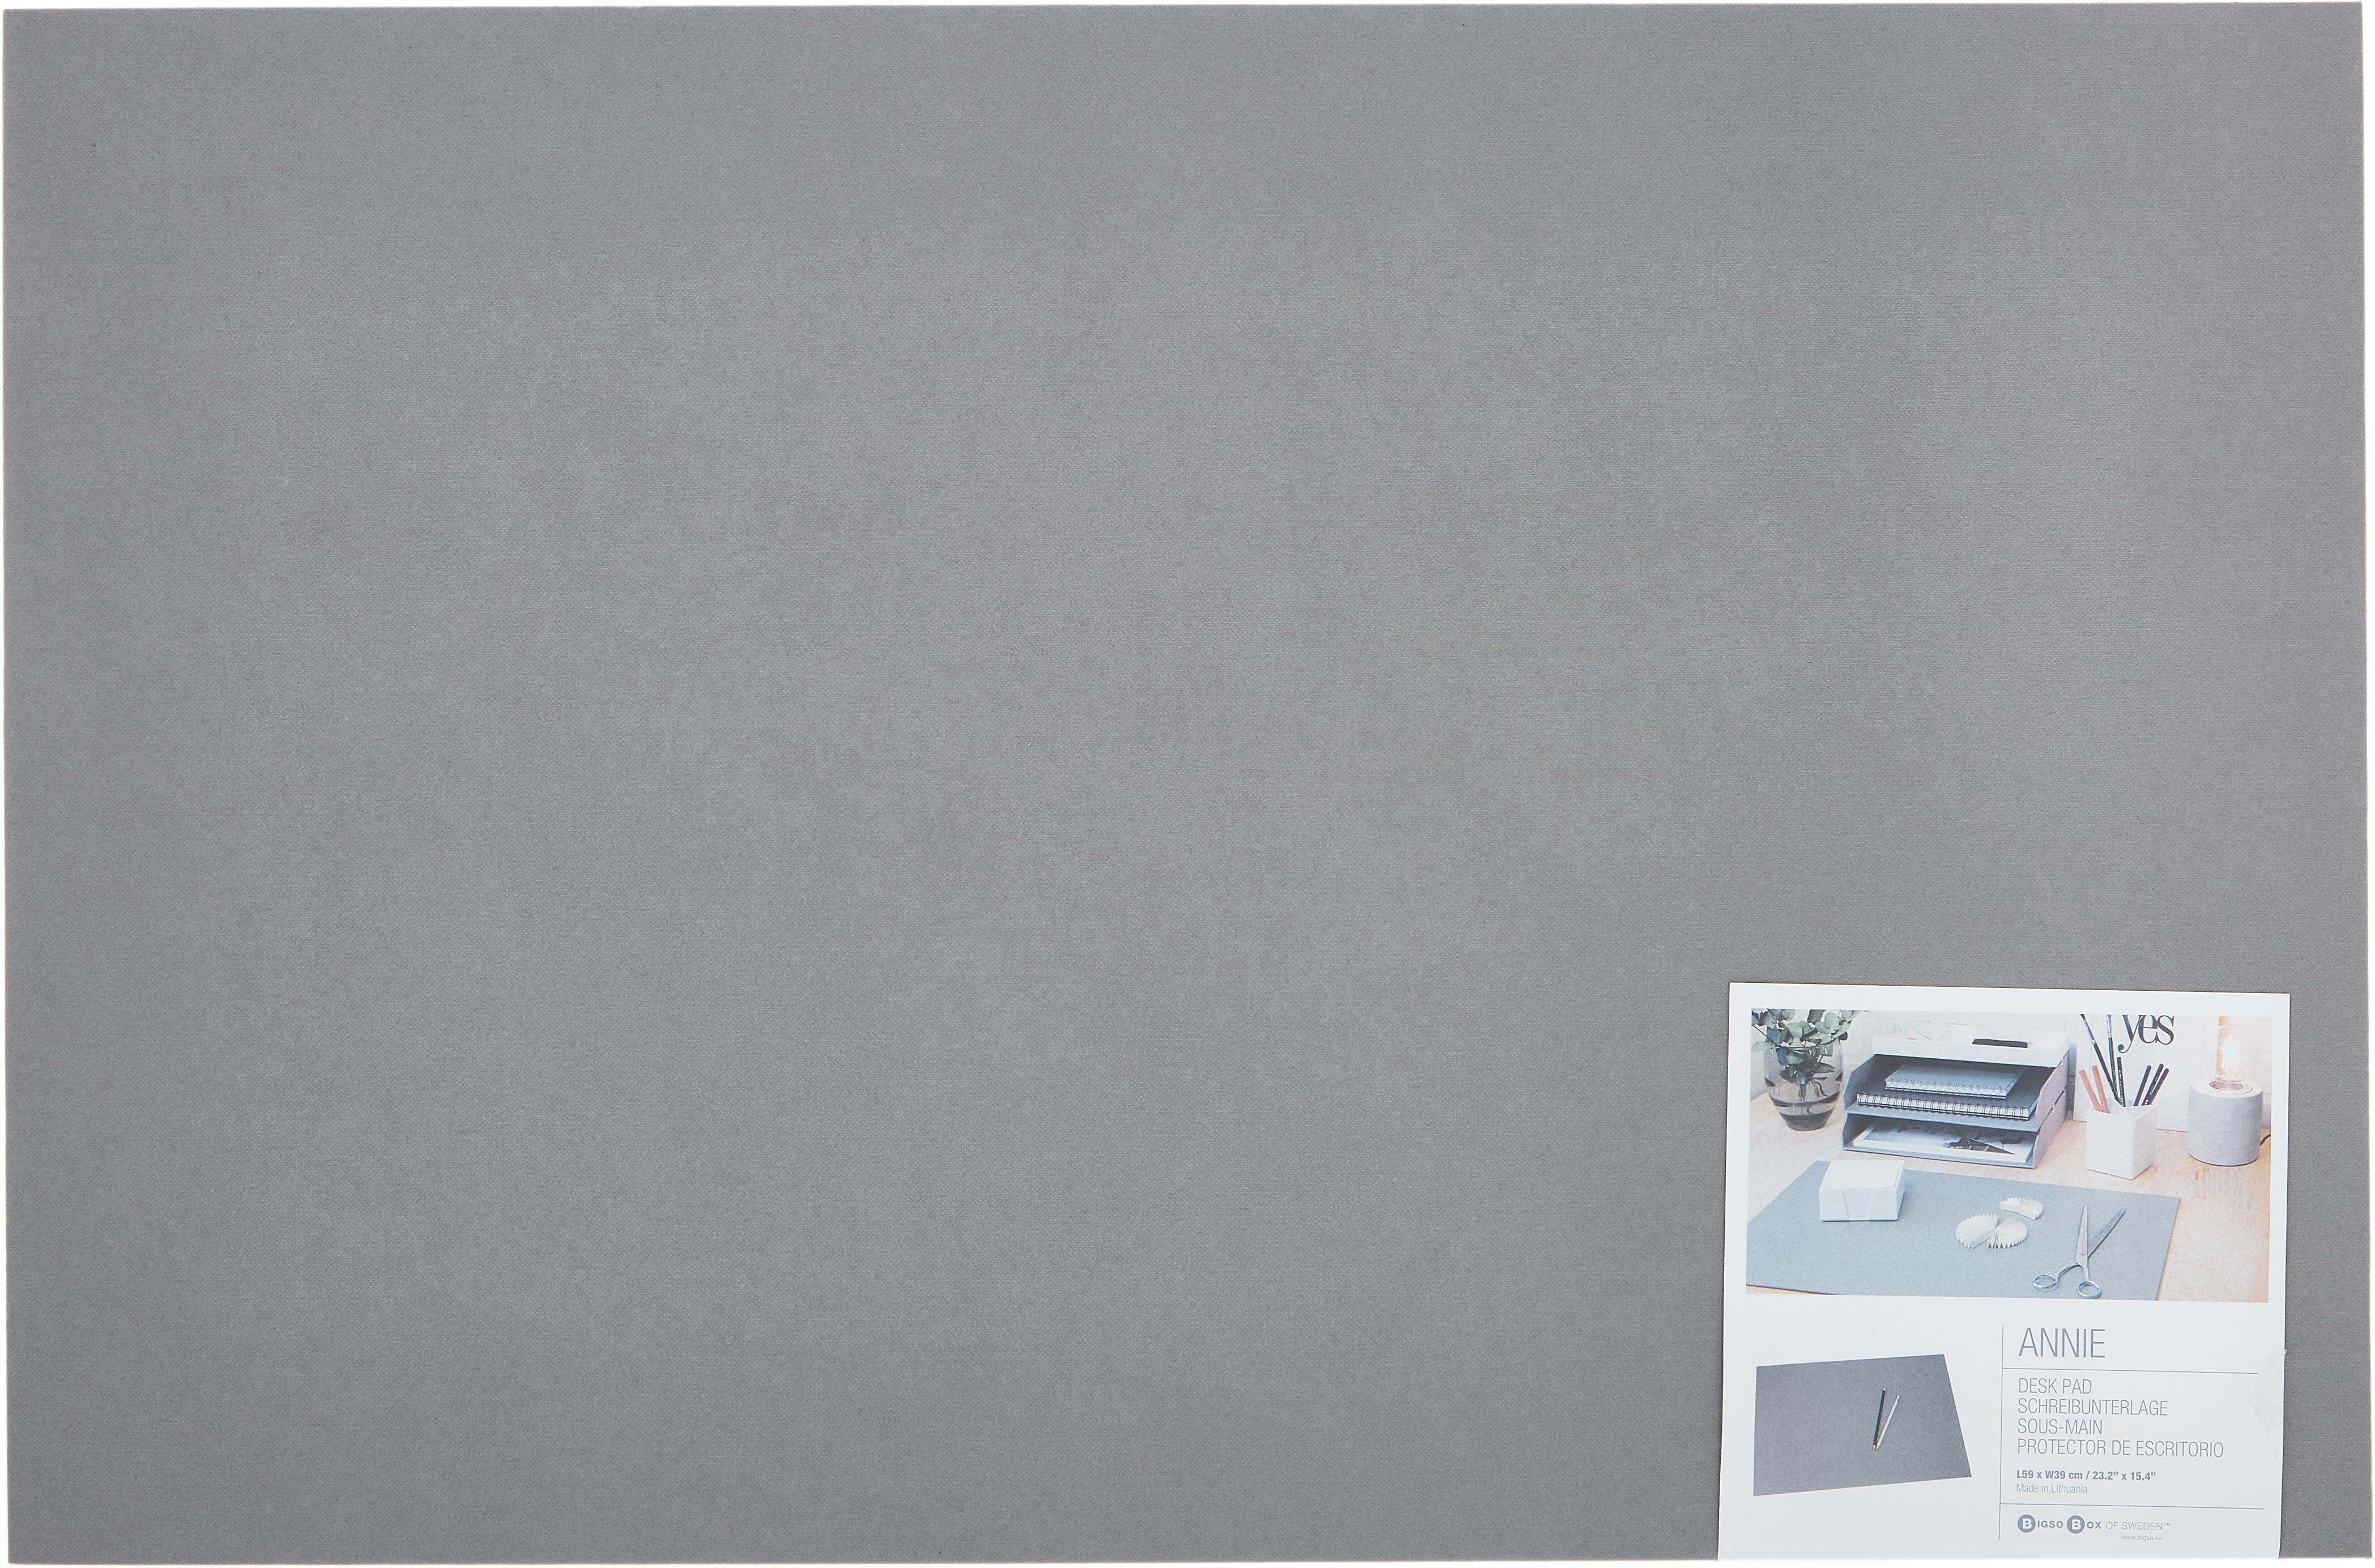 Podkładka na biurko Annie, Tektura laminowana, Szary, S 59 x G 39 cm